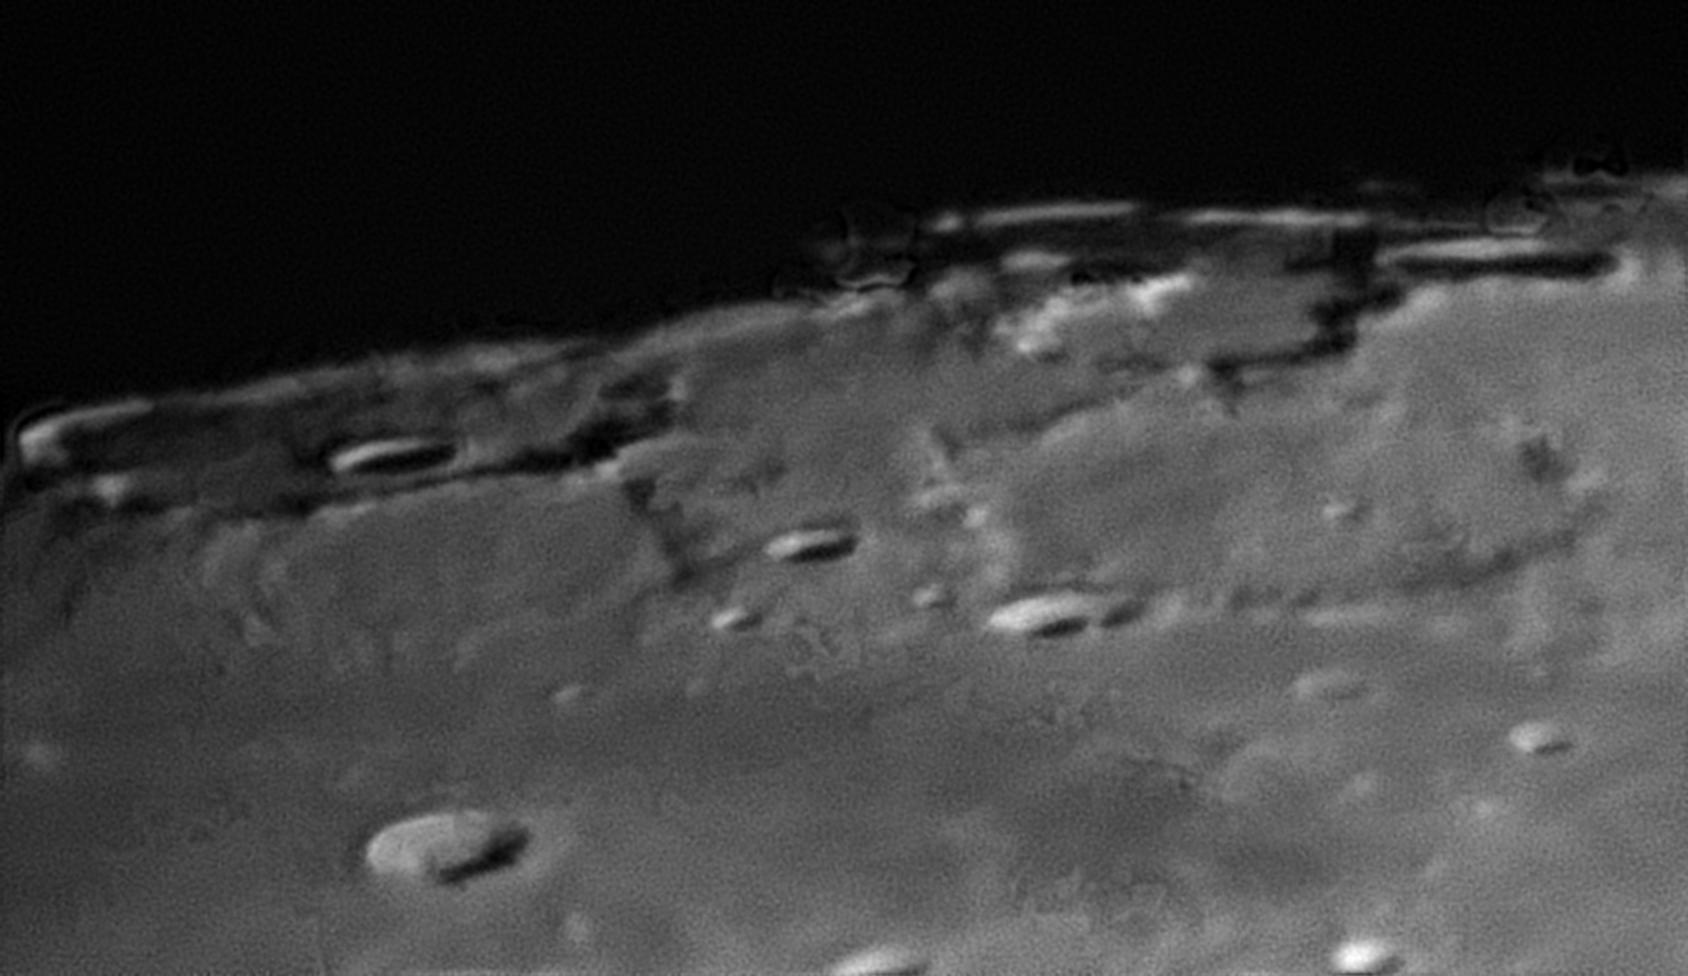 2021-02-24-2143_1-IR-Moon_lapl5_ap437_AS_hercshel_harpalus.png.ec5439d7673445efecb8d13e792c32be.png